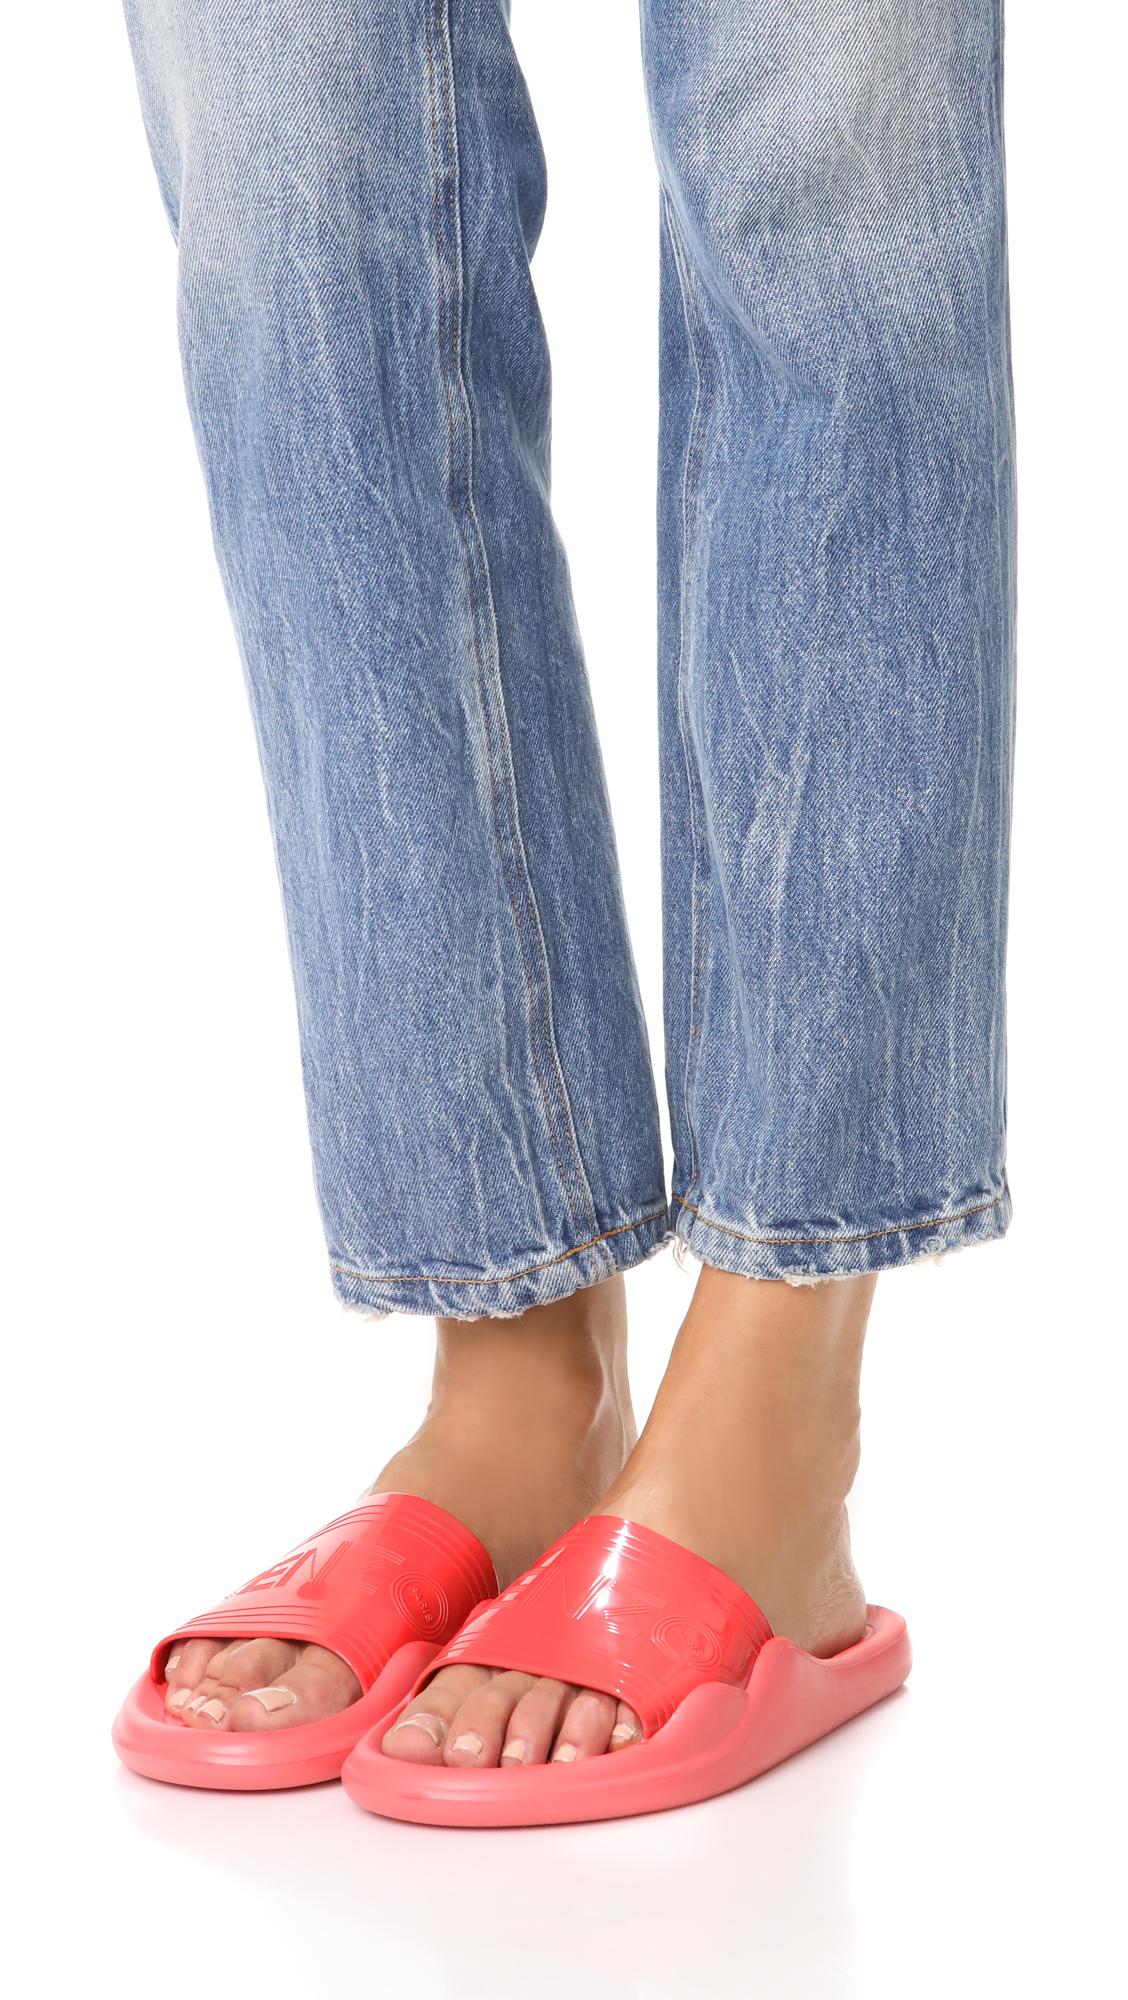 c6ade0ff1 KENZO Pool Slide Sandals   SHOPBOP